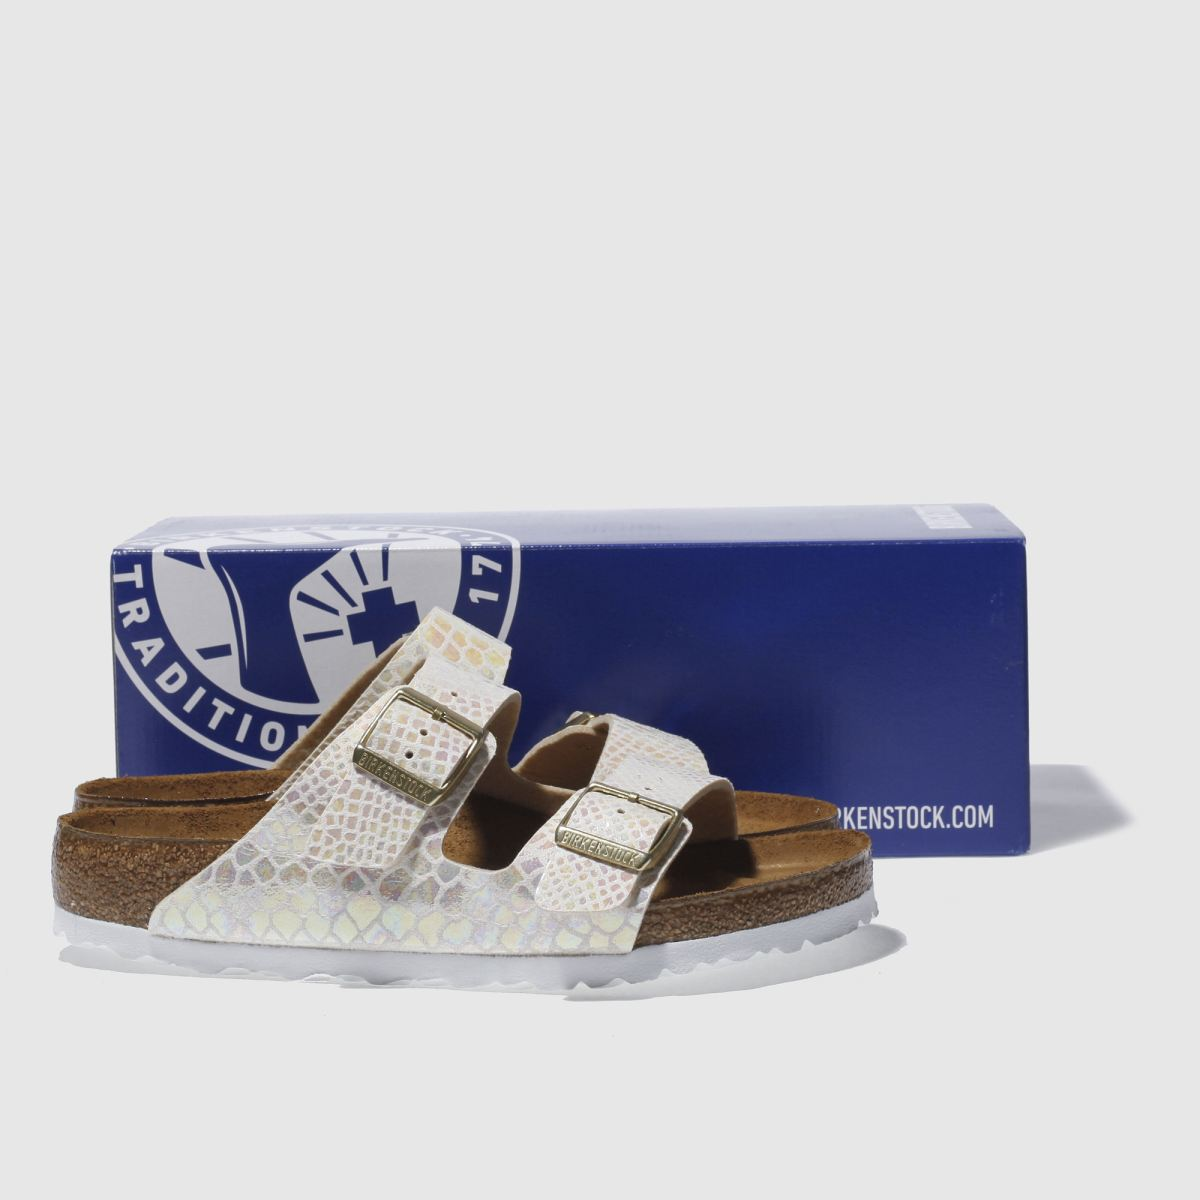 Damen Steingrau birkenstock Arizona Shiny Snake Sandalen | Schuhe schuh Gute Qualität beliebte Schuhe | 048163